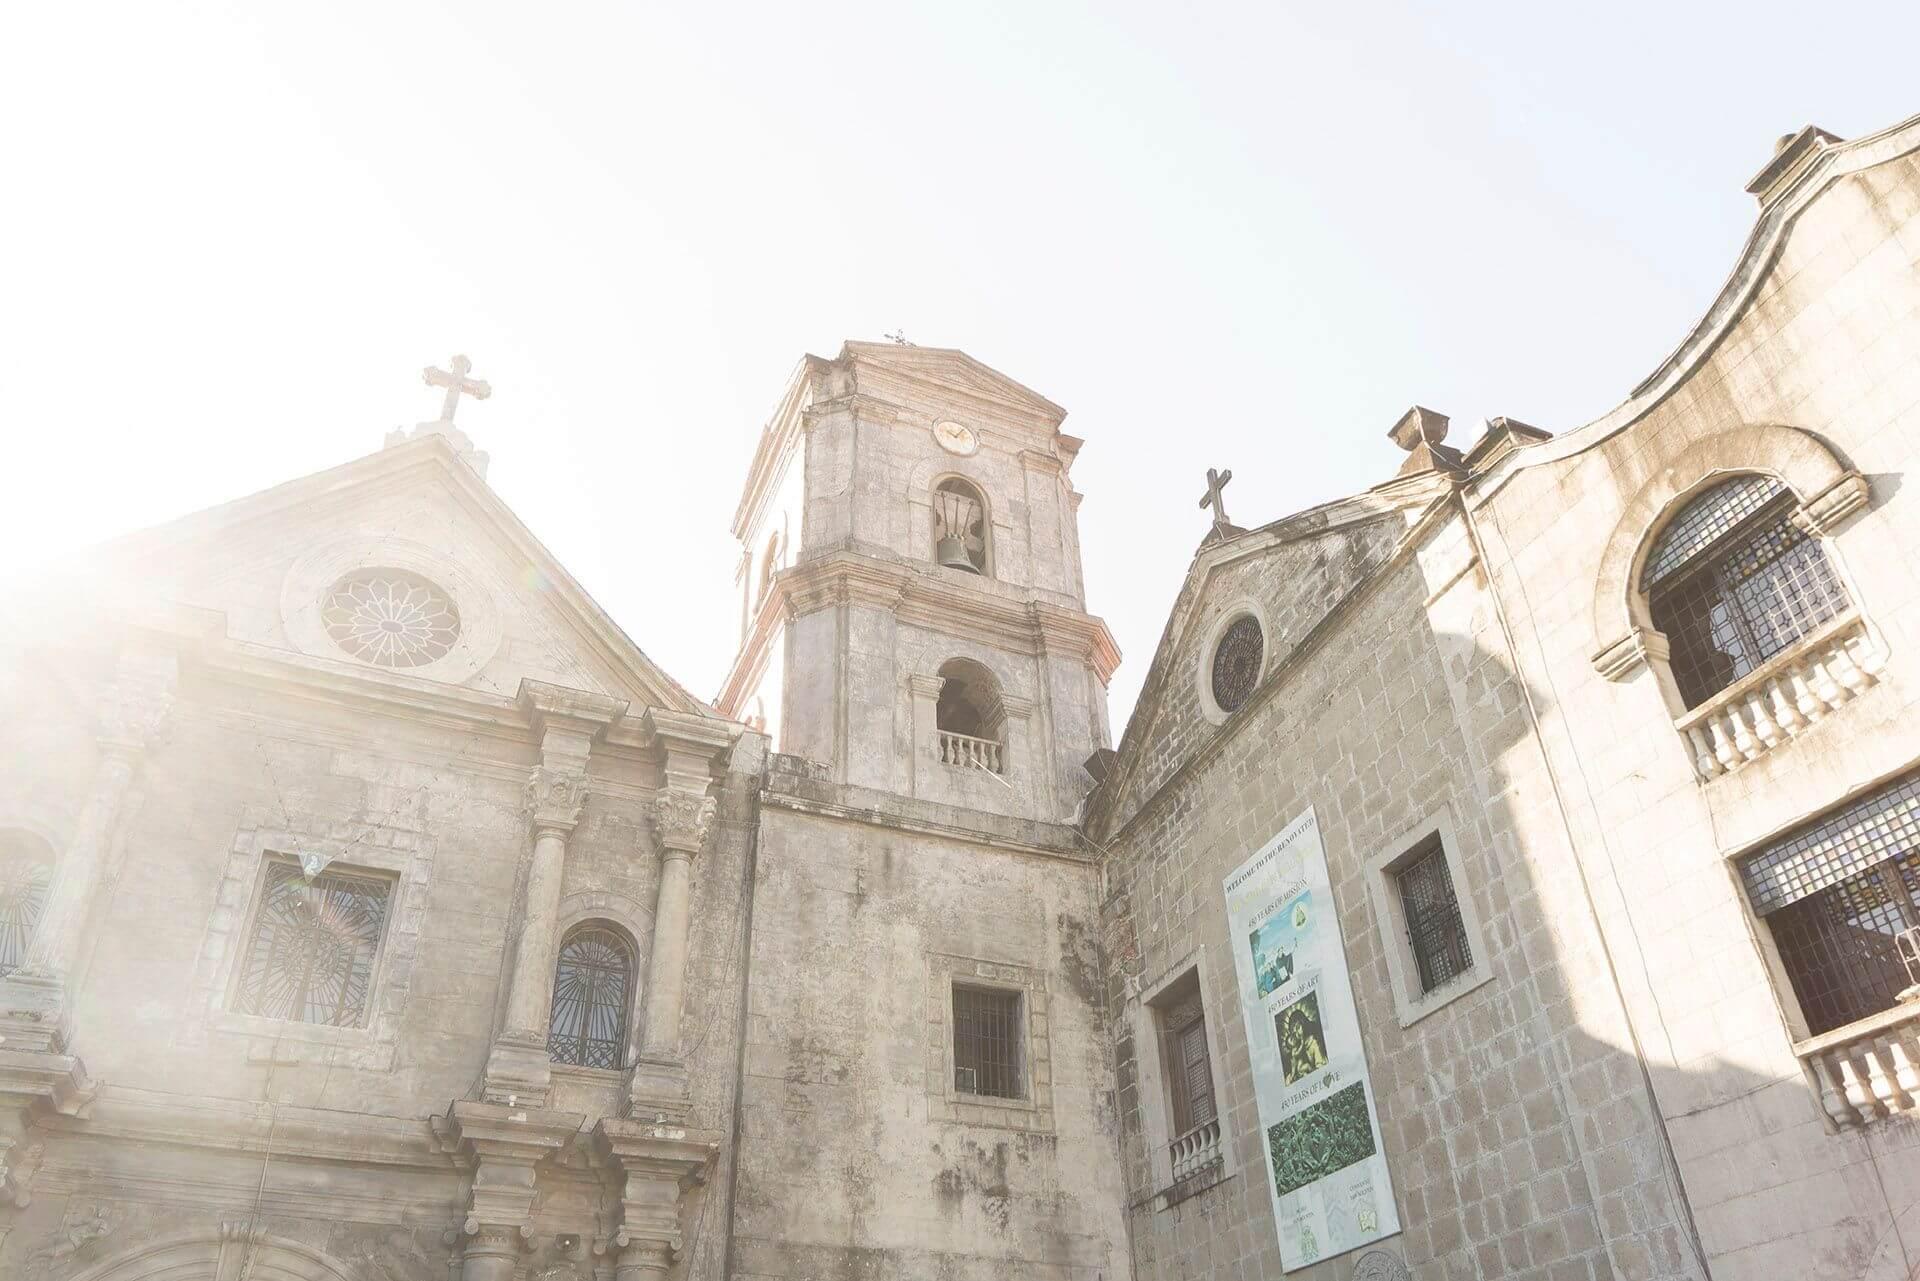 Facade of San Agustin Church